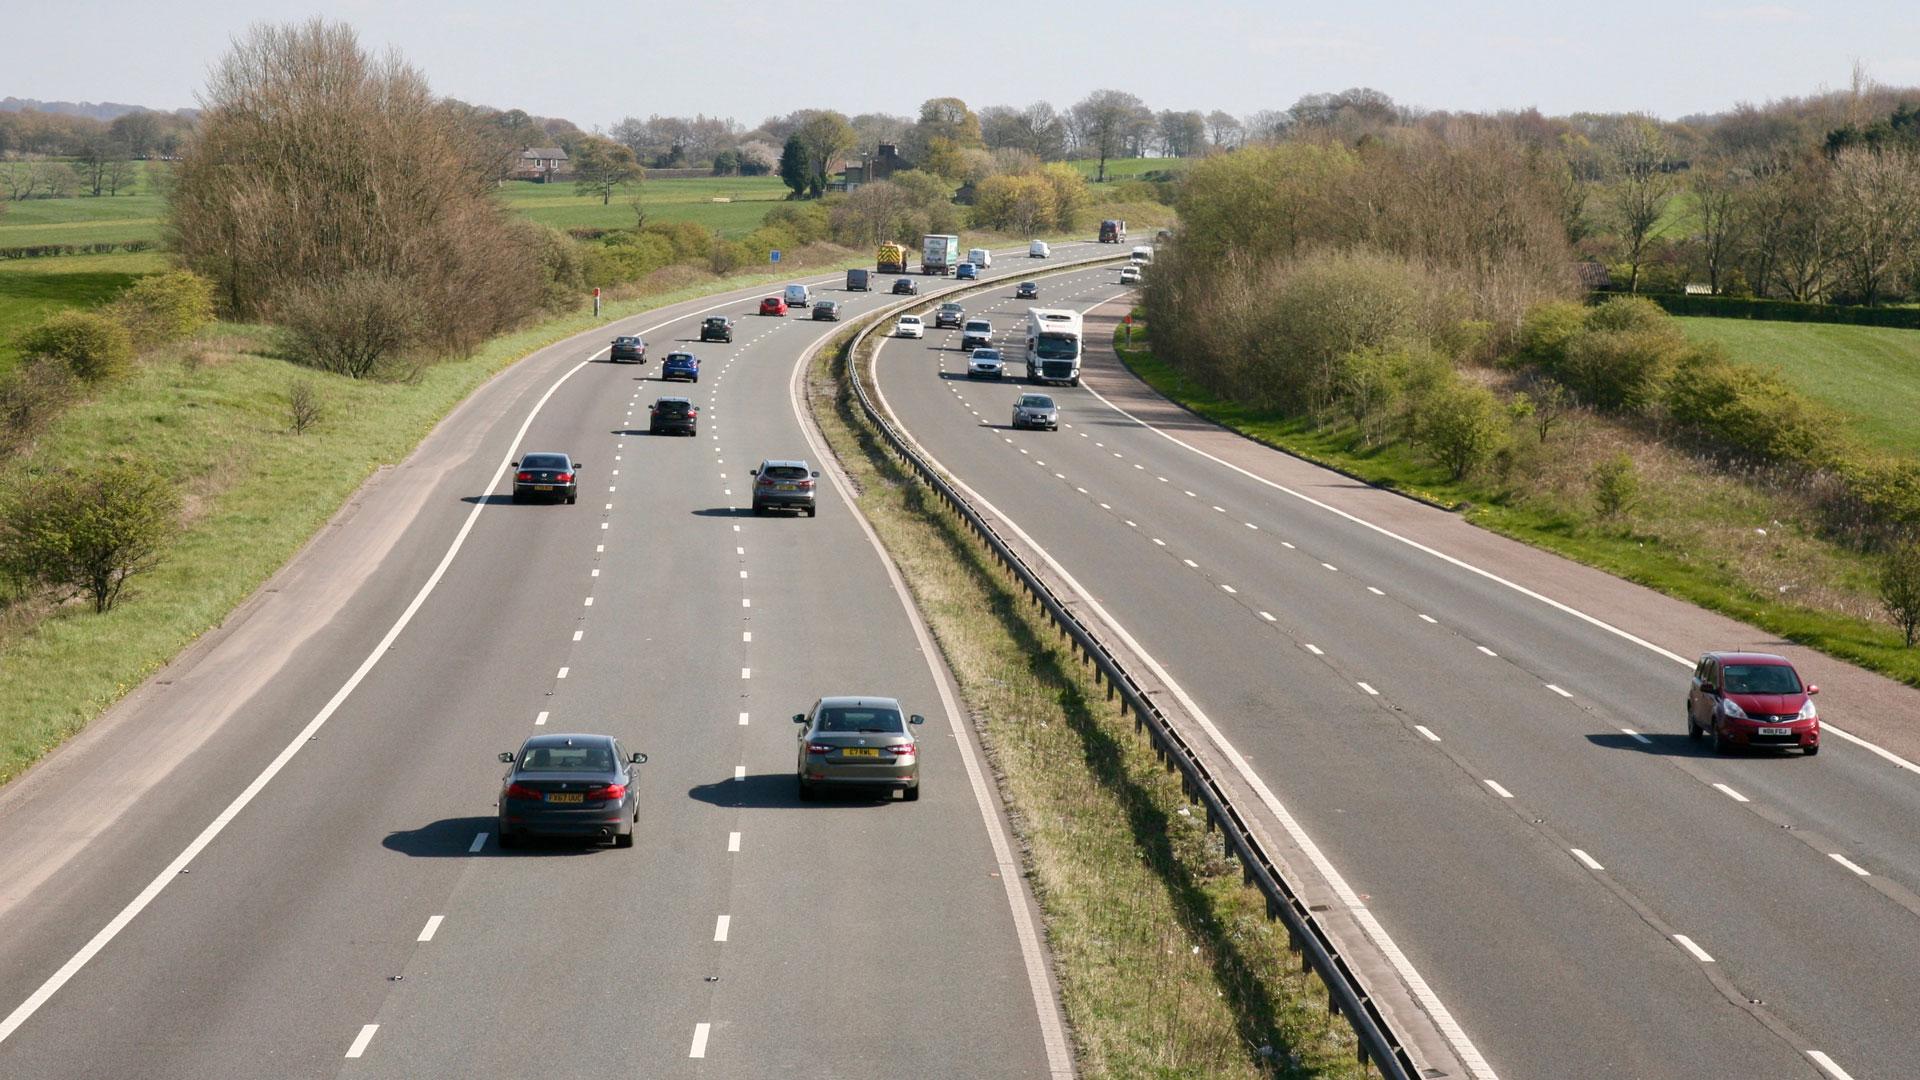 Traffic-free roads